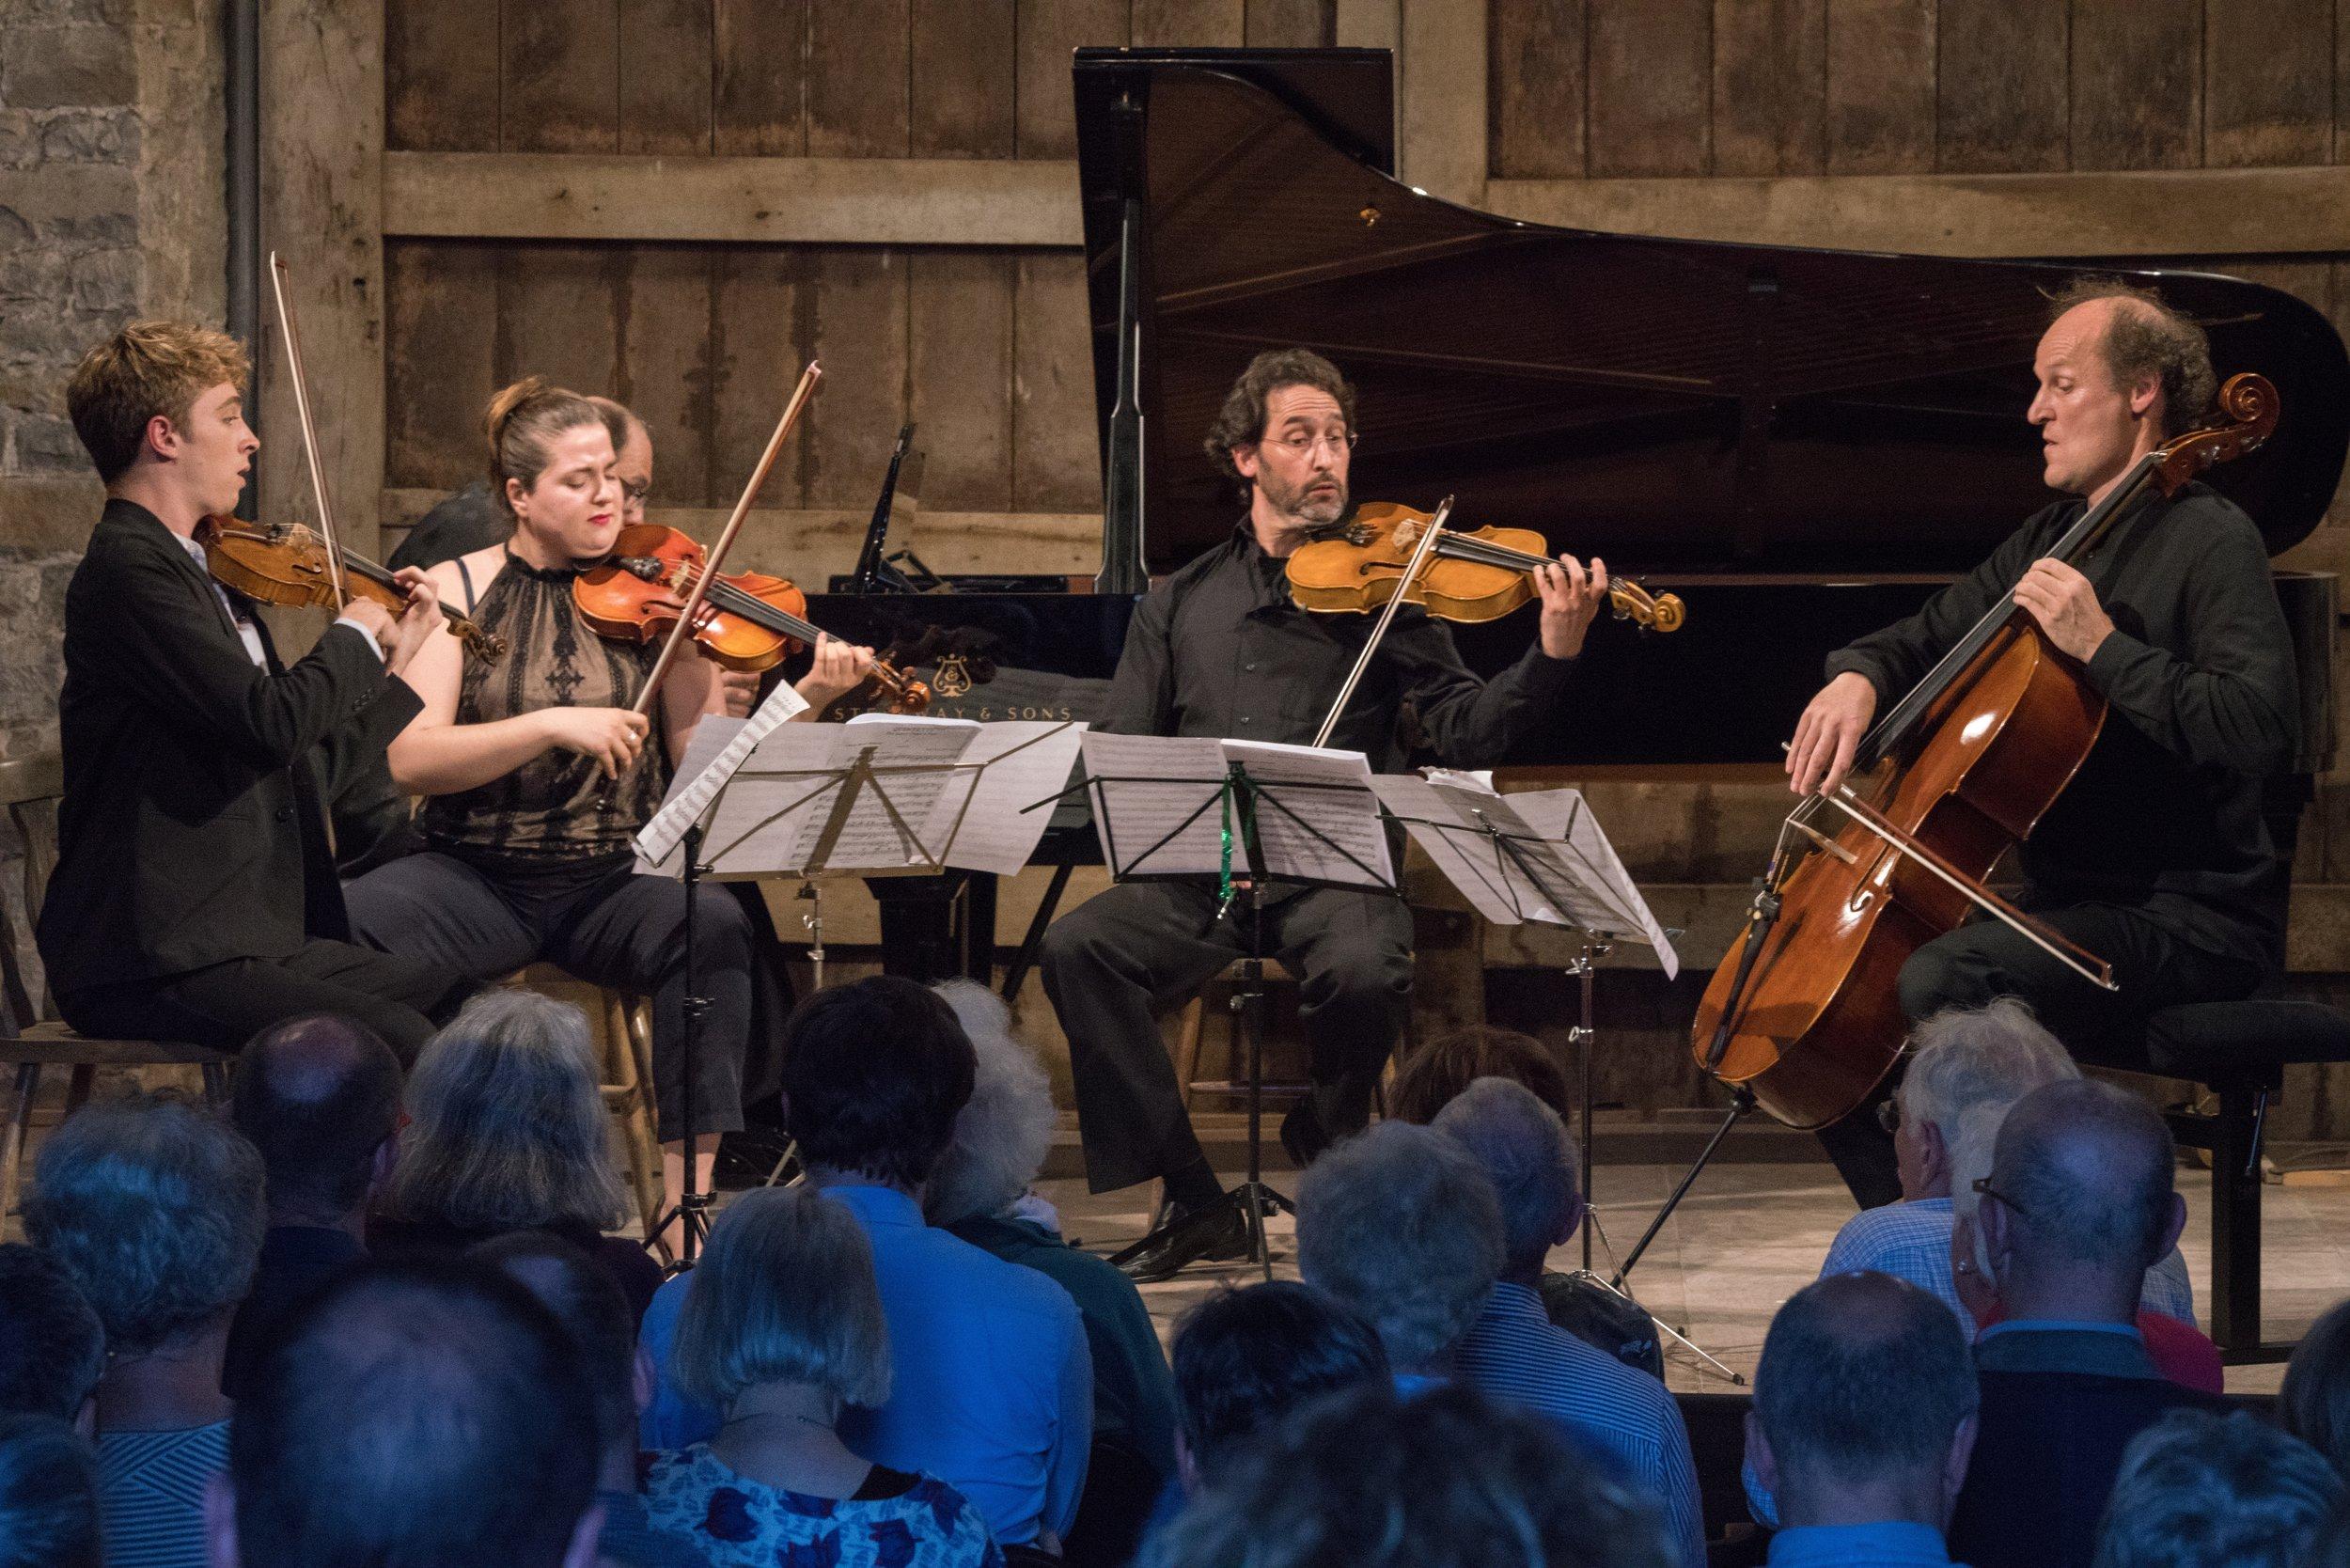 Reynaldo Hahn Piano Quintet with Tim Crawford, Natalia Kotarba, Guy Ben-Ziony, Martijn Vink, Muhiddin Dürrüoğlu